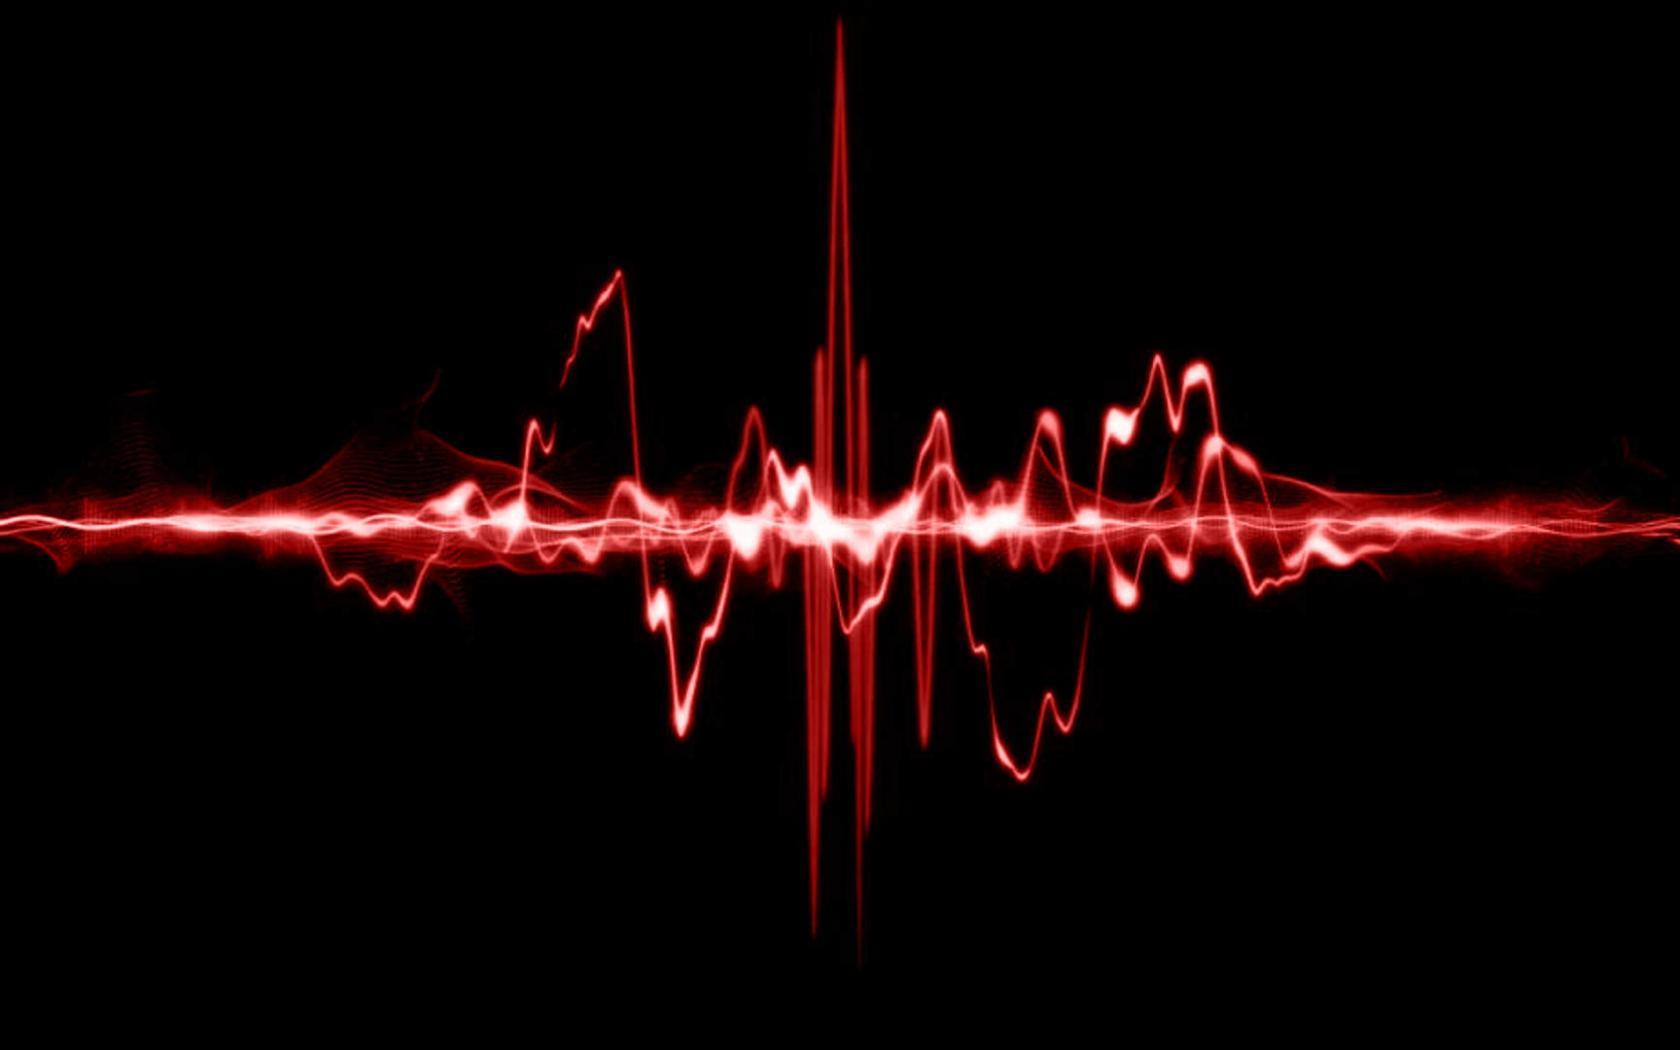 картинки ритм сердца на черном фоне уткой фенхелем под